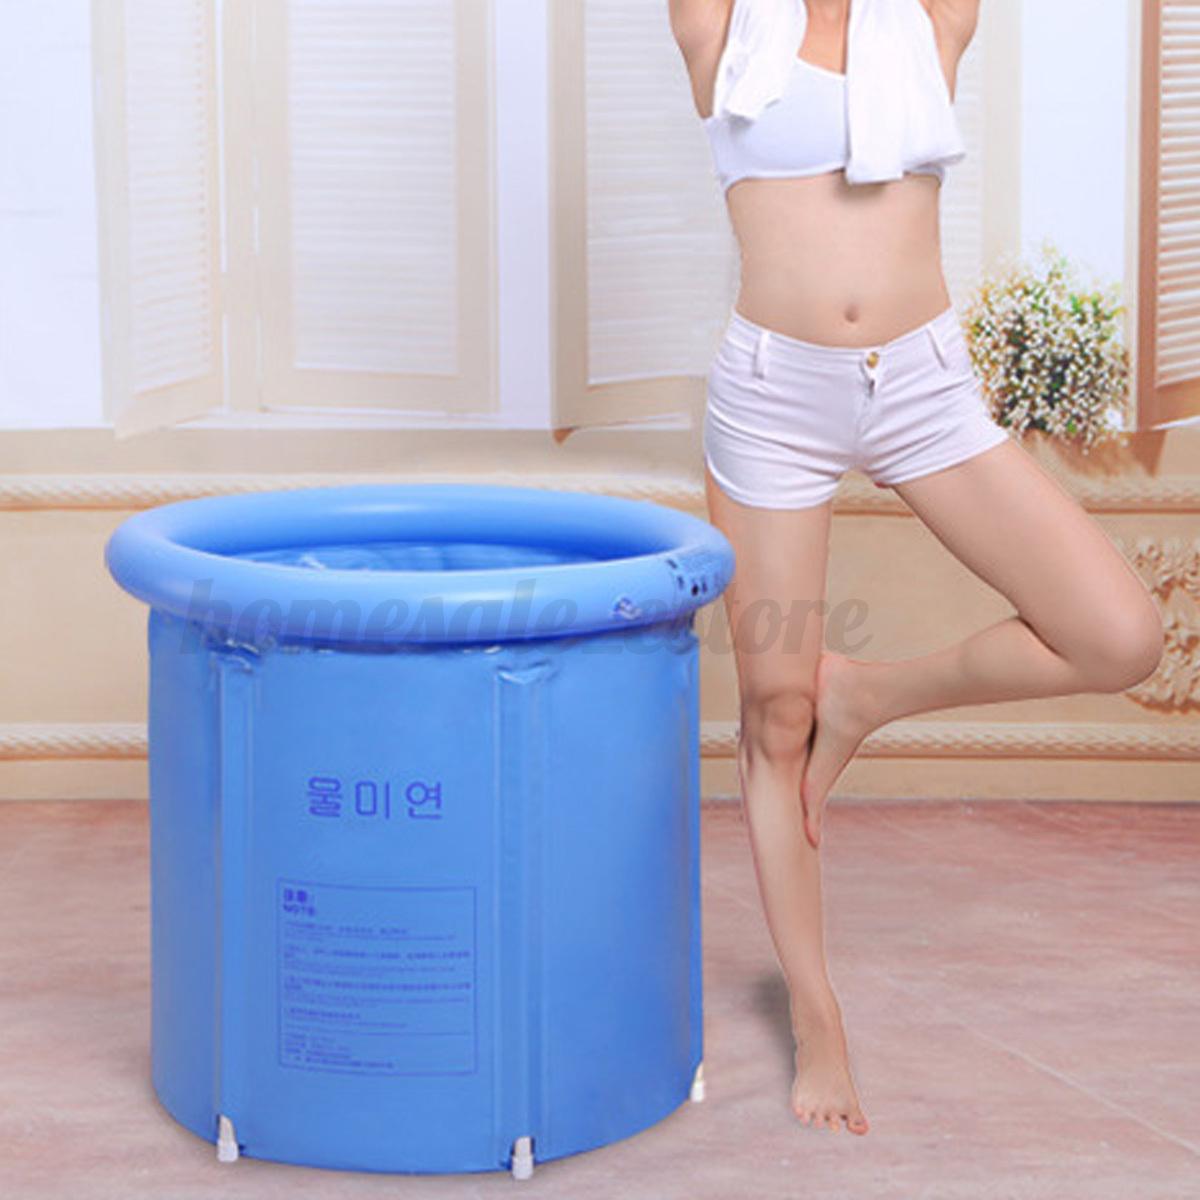 folding bathtub portable plastic tub foldable water place. Black Bedroom Furniture Sets. Home Design Ideas